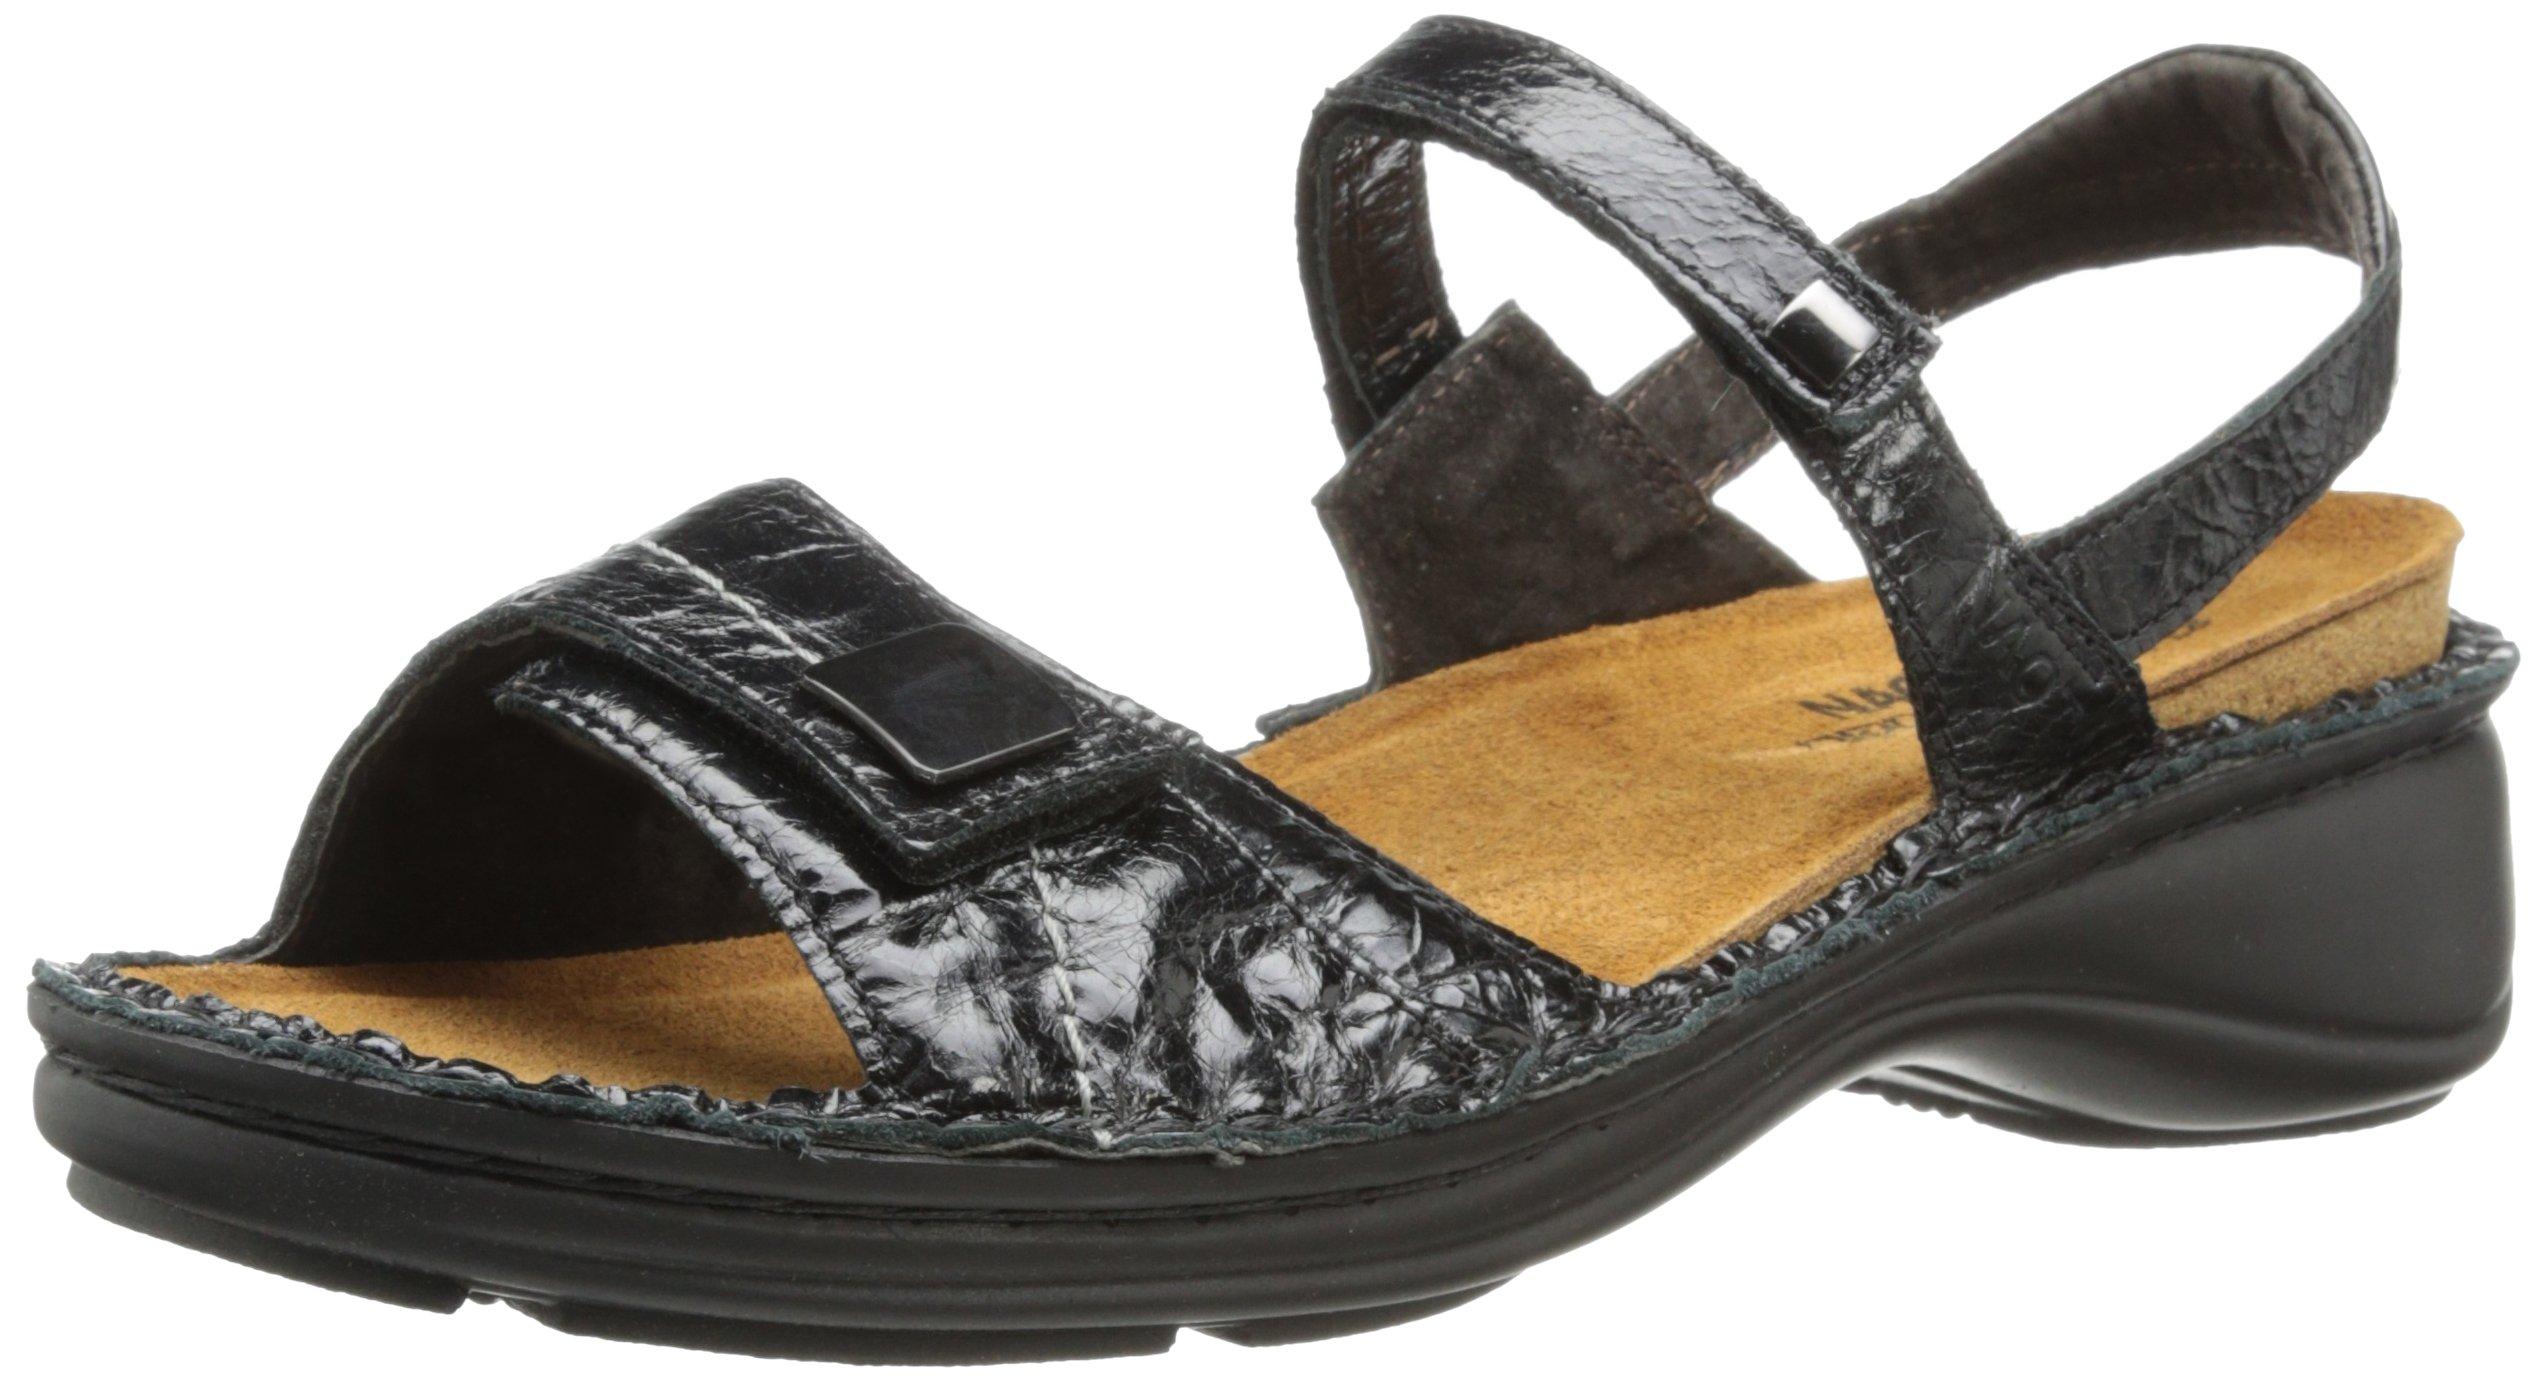 Naot Women's Papaya Flat,Black Madras Leather,40 EU/8.5-9 M US by NAOT (Image #1)